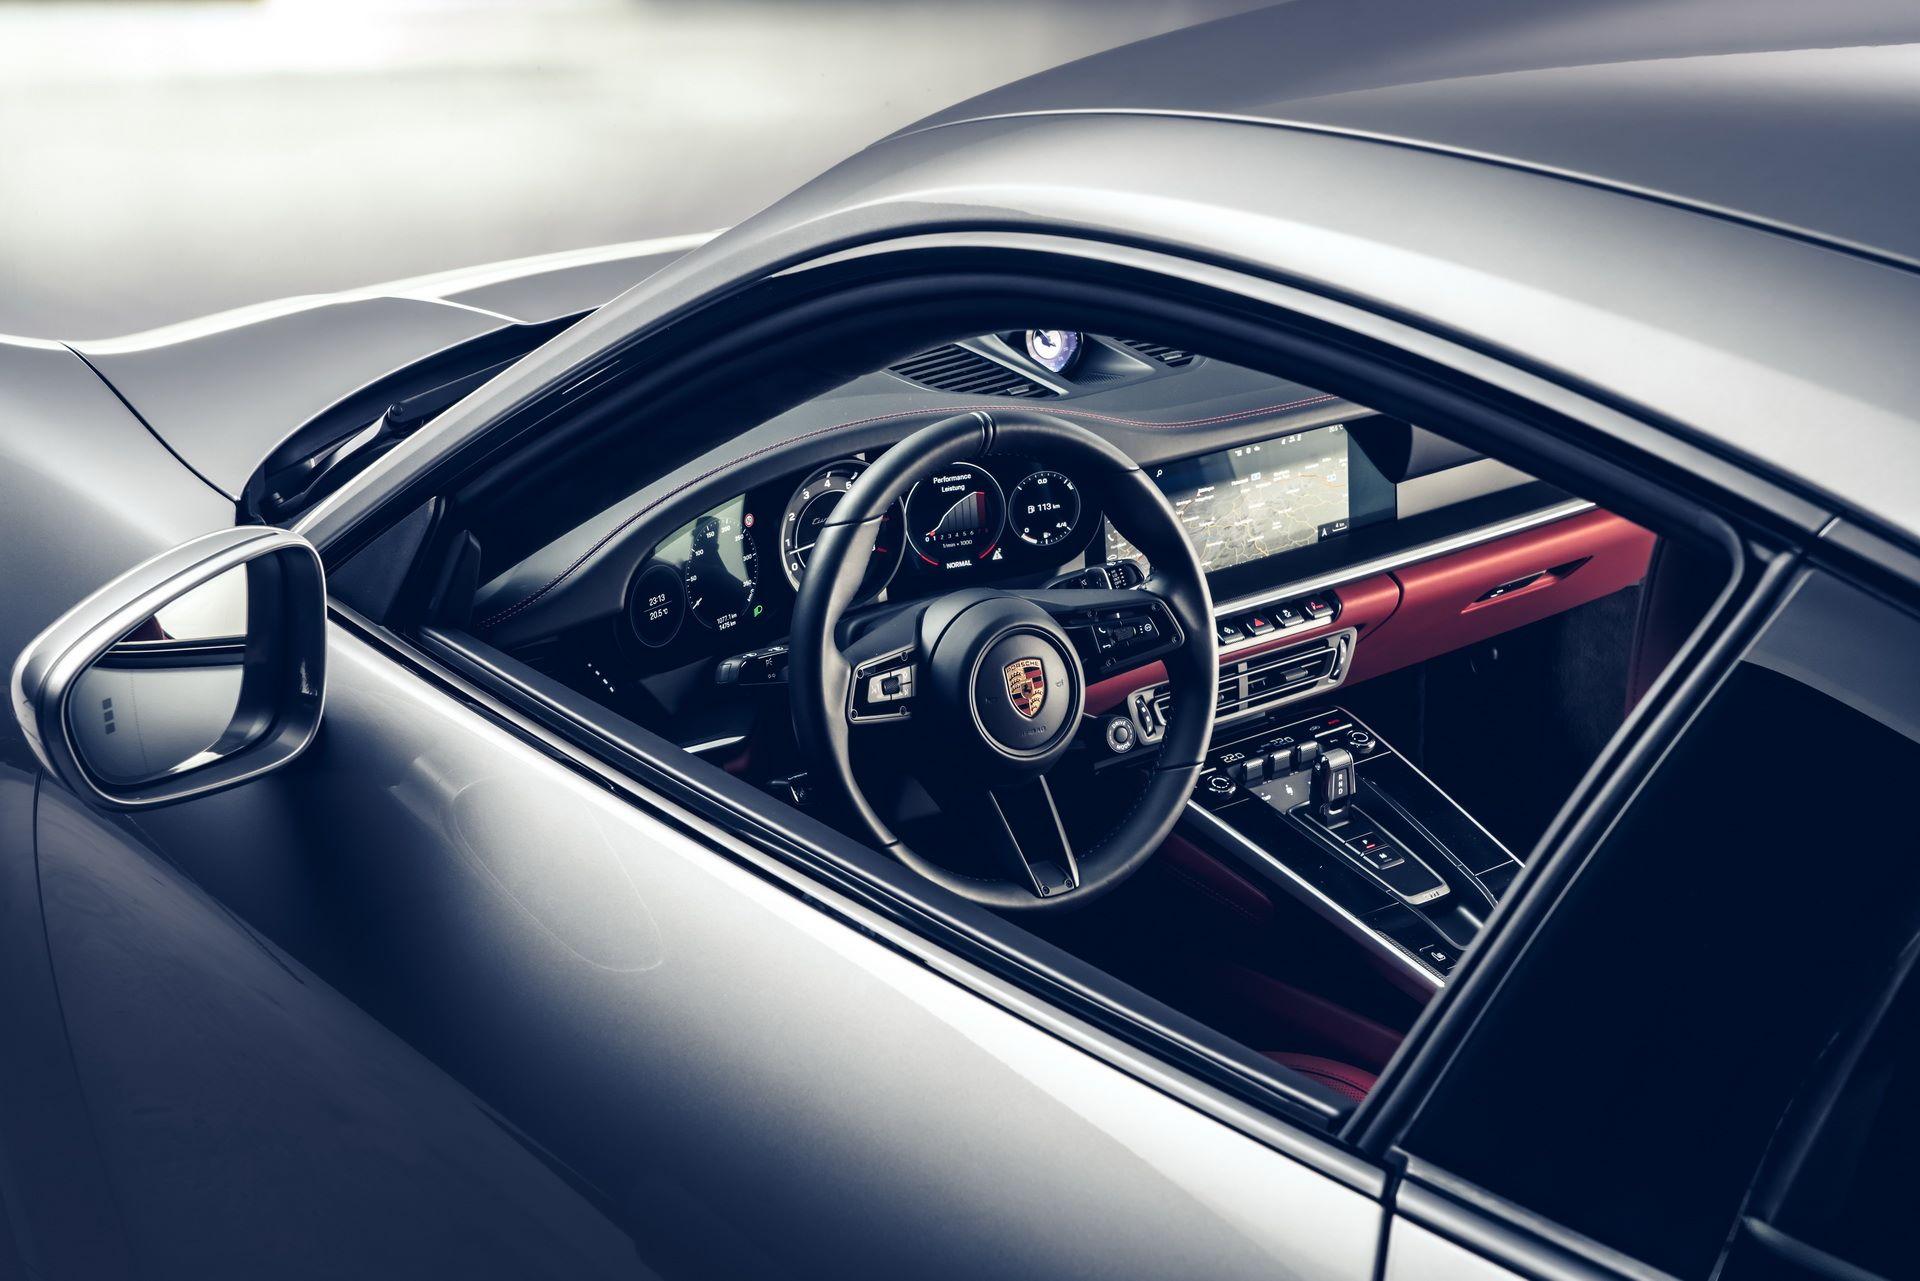 Porsche-911-Turbo-S-2020-19